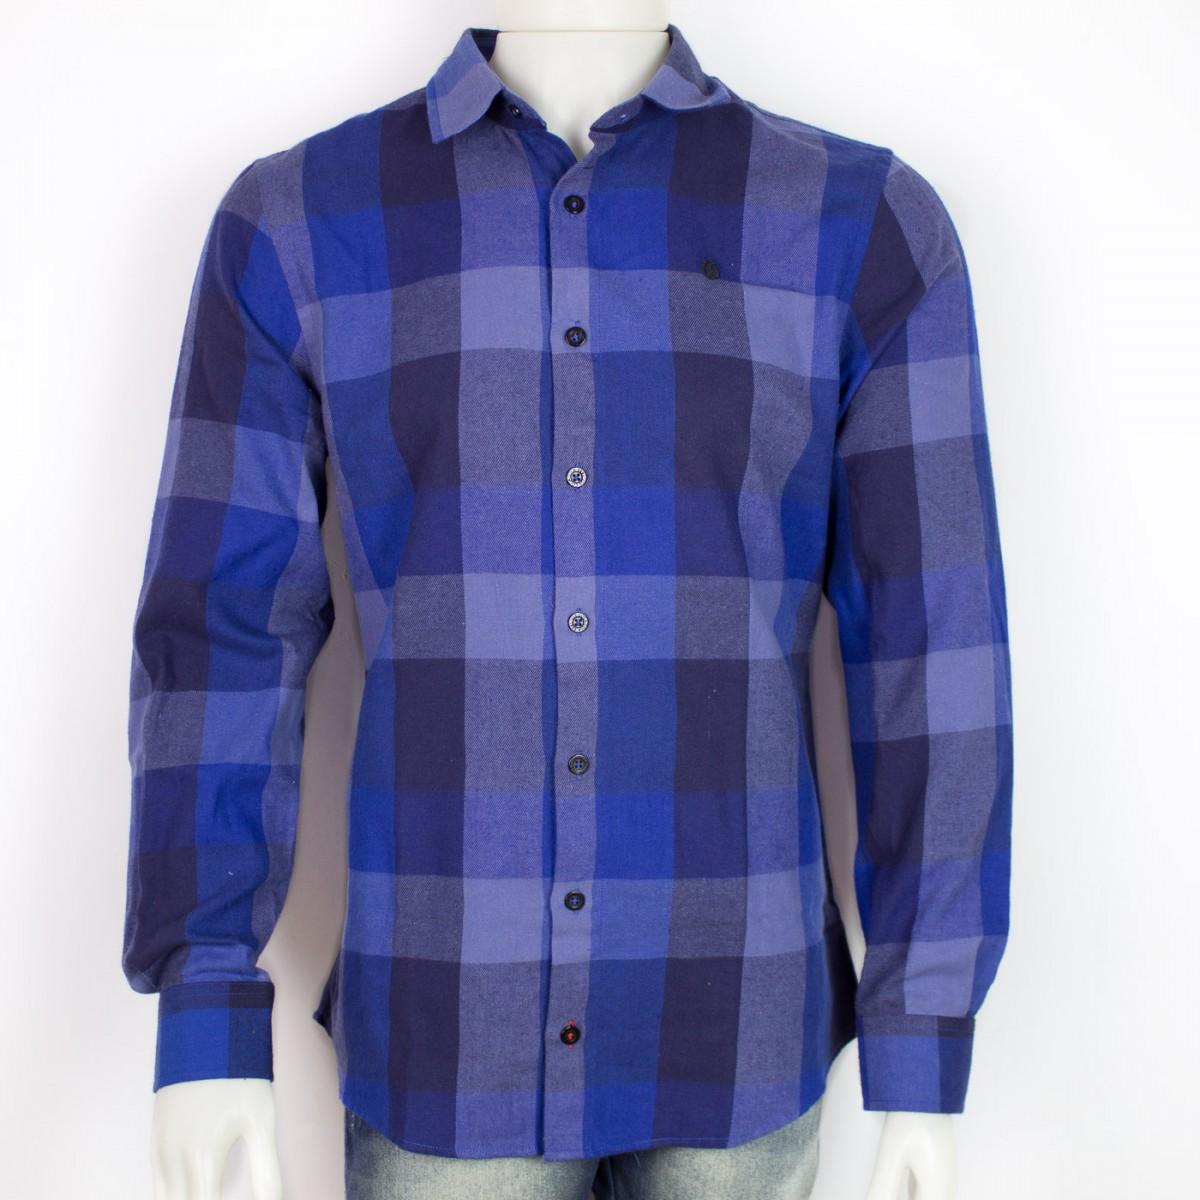 8427fd4e36 Bizz Store - Camisa Xadrez Masculina Coca-Cola Azul Manga Longa